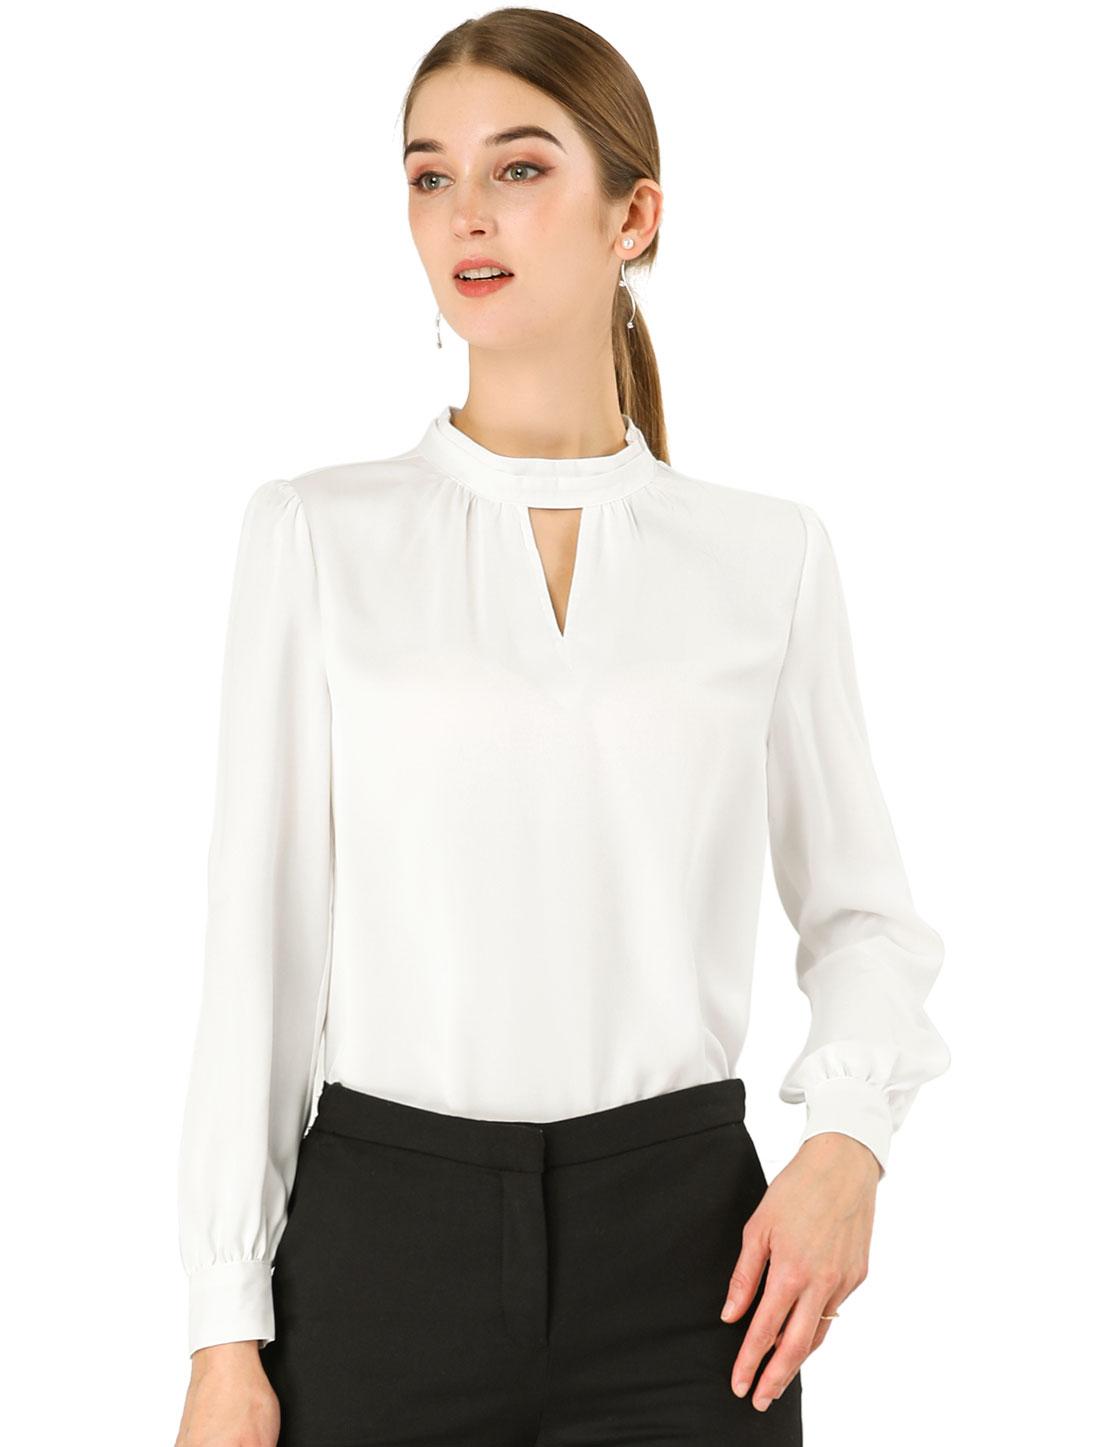 Allegra K Women's Keyhole Stand Collar Long Sleeve Blouse White XL (US 18)